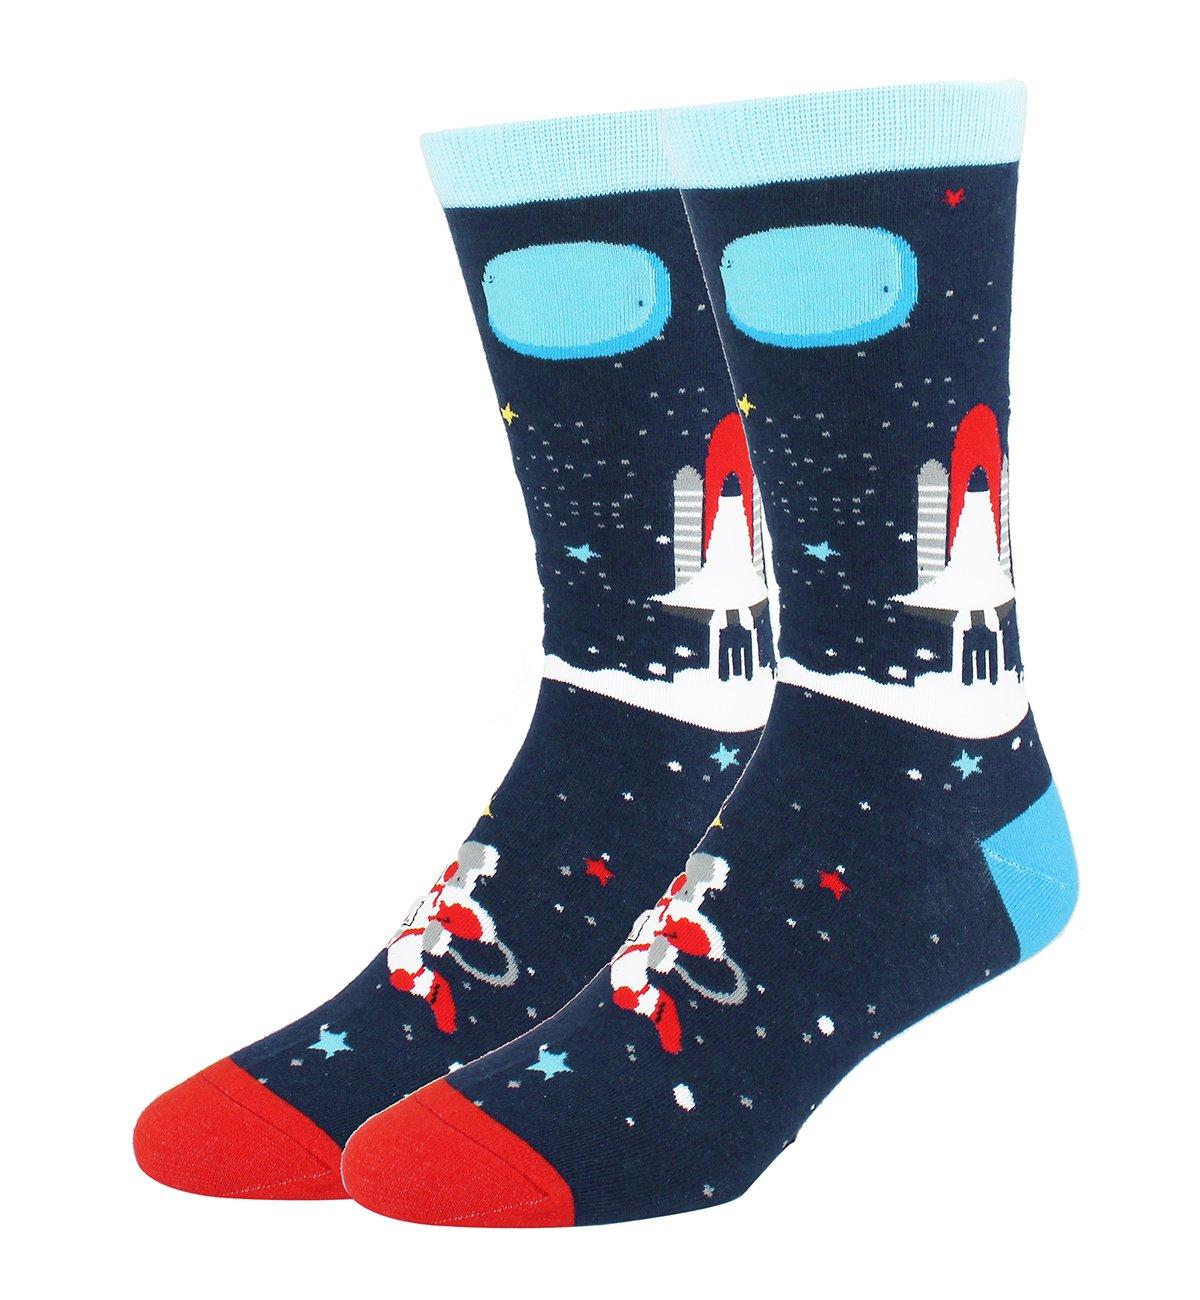 Happypop Mens Funny Crew Socks Novelty Crazy Cotton Dress Socks Cool Space Rocket Whale Socks for Men